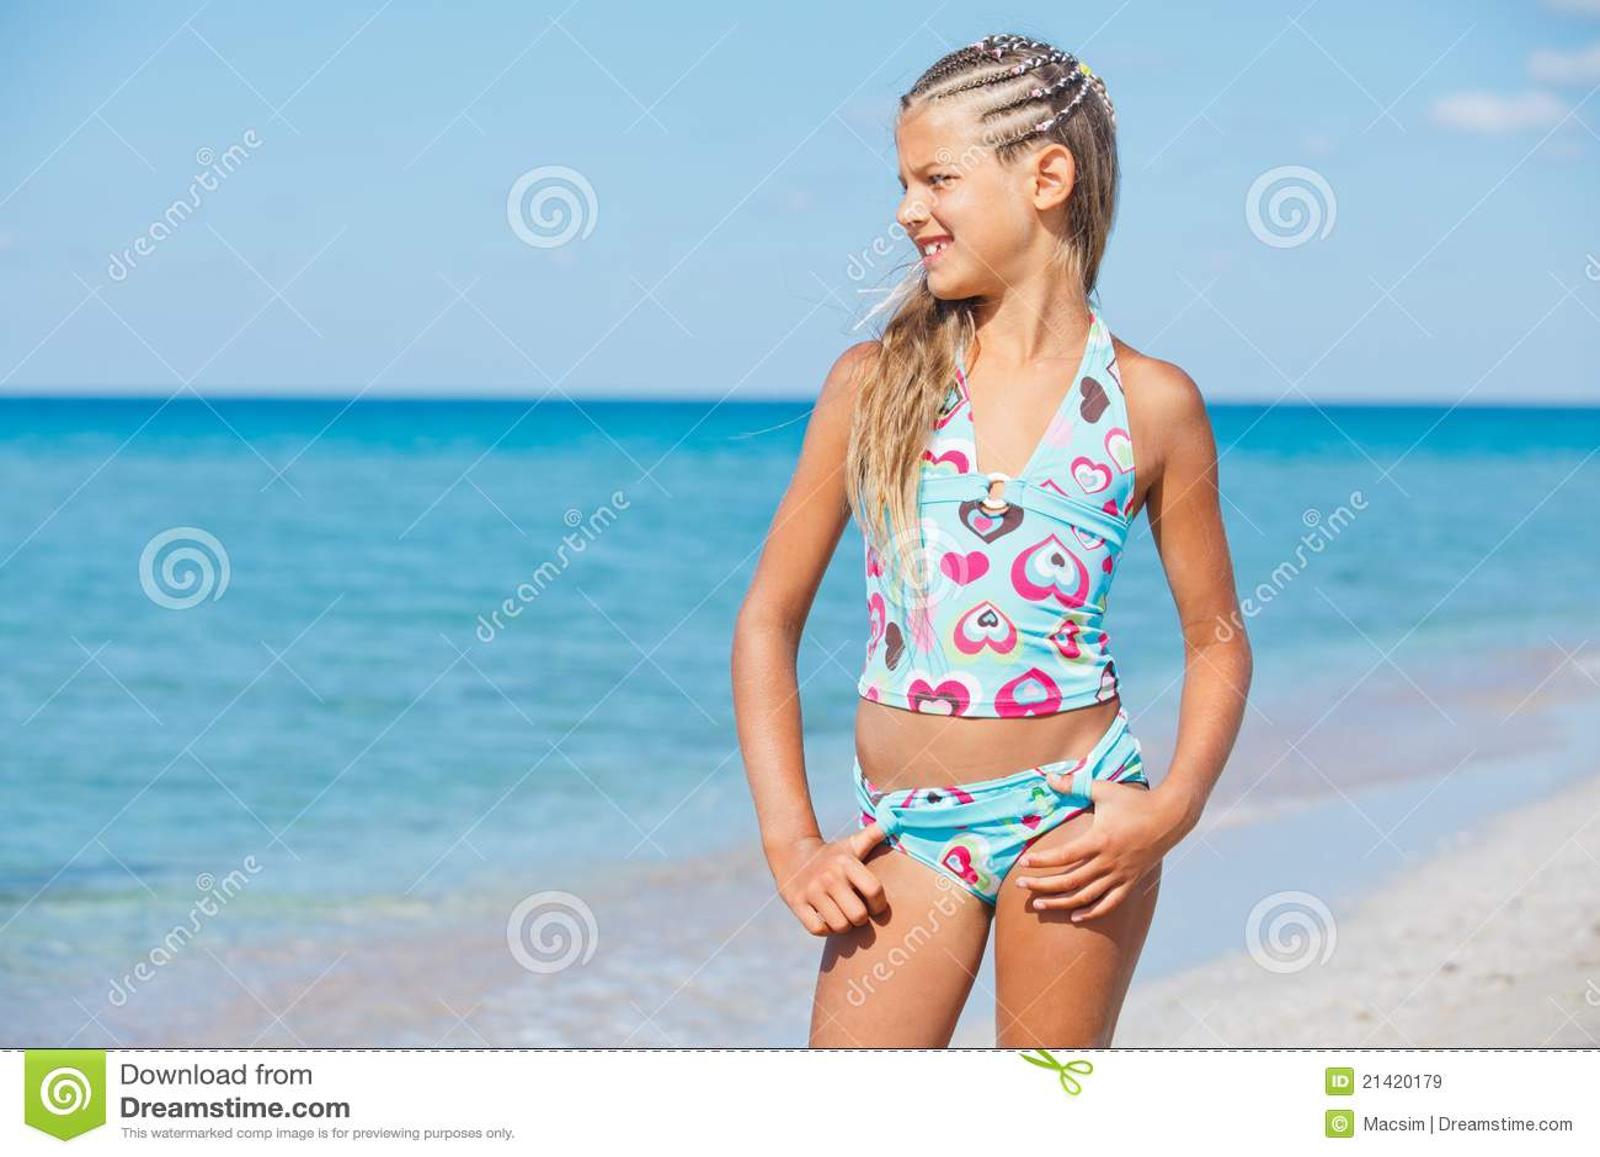 Camy Oceane Dreams Set